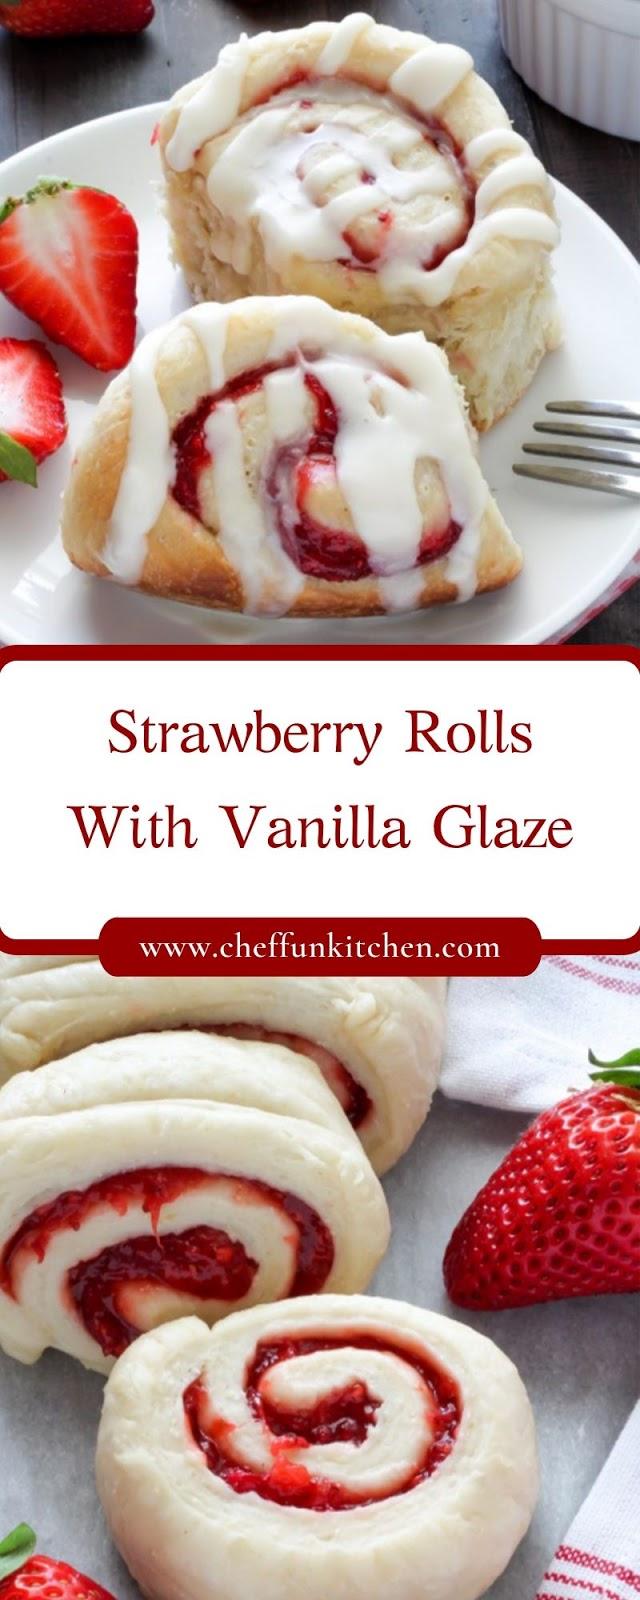 Strawberry Rolls With Vanilla Glaze